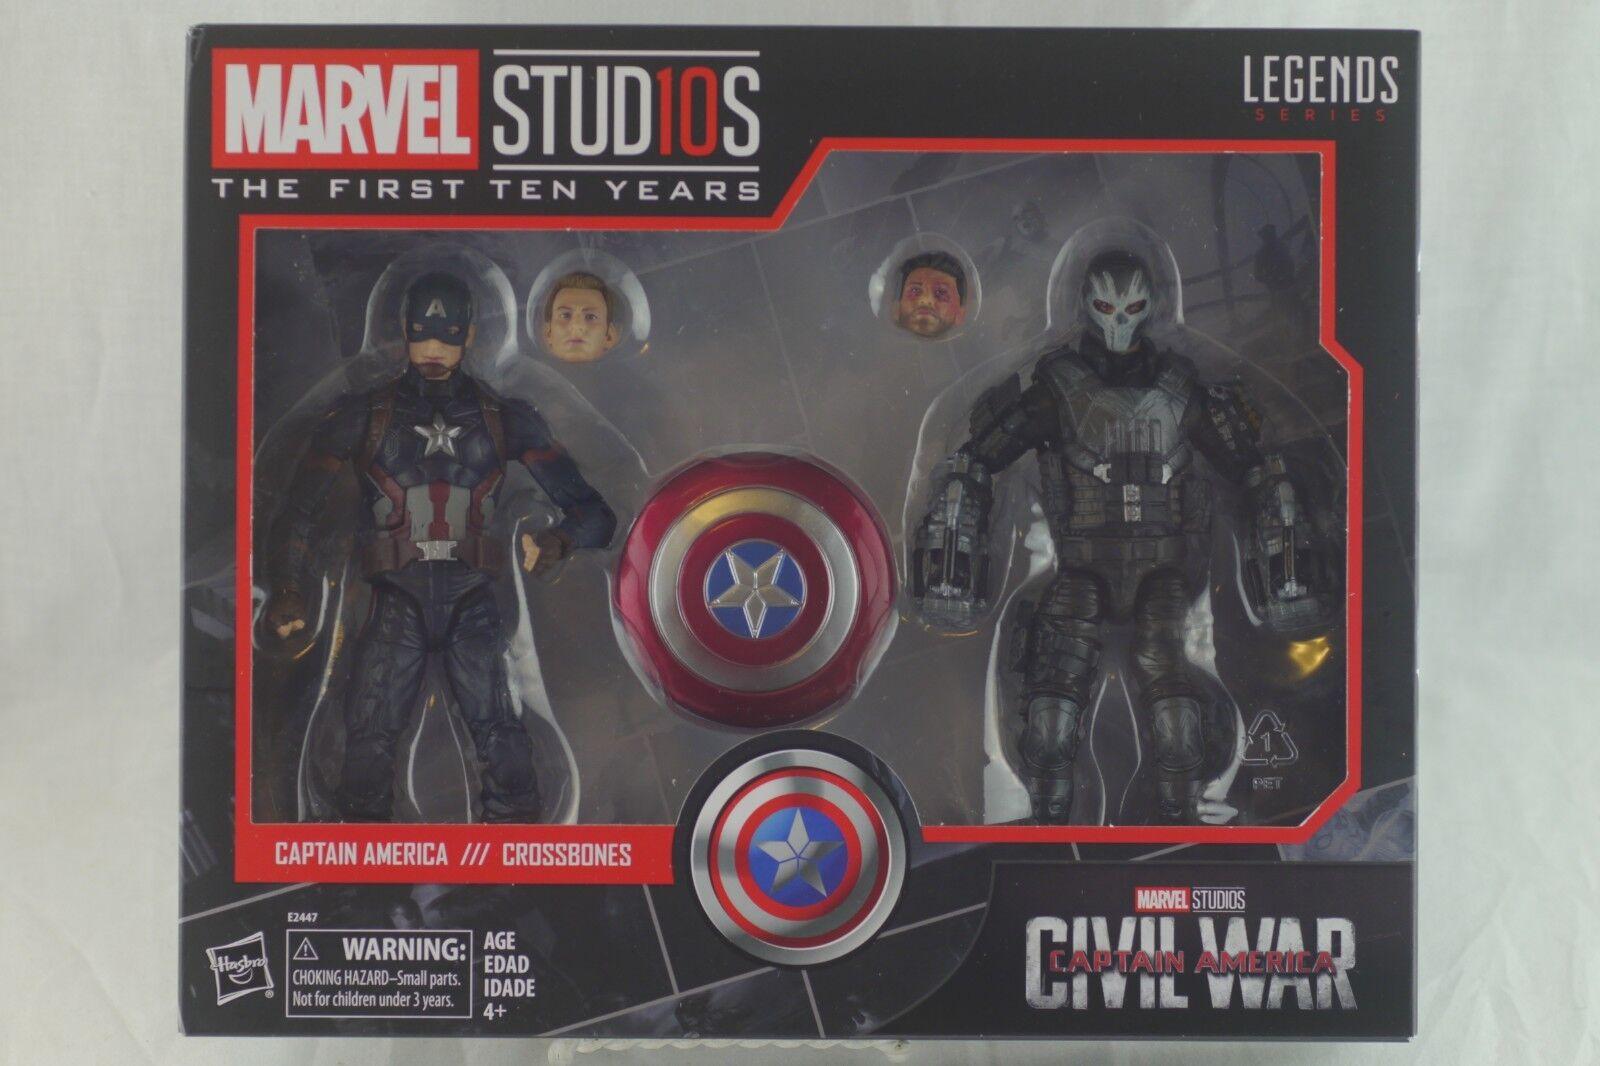 Marvel Legends Studios CAPTAIN AMERICA & CROSSBONES primero 10 Years Civil War